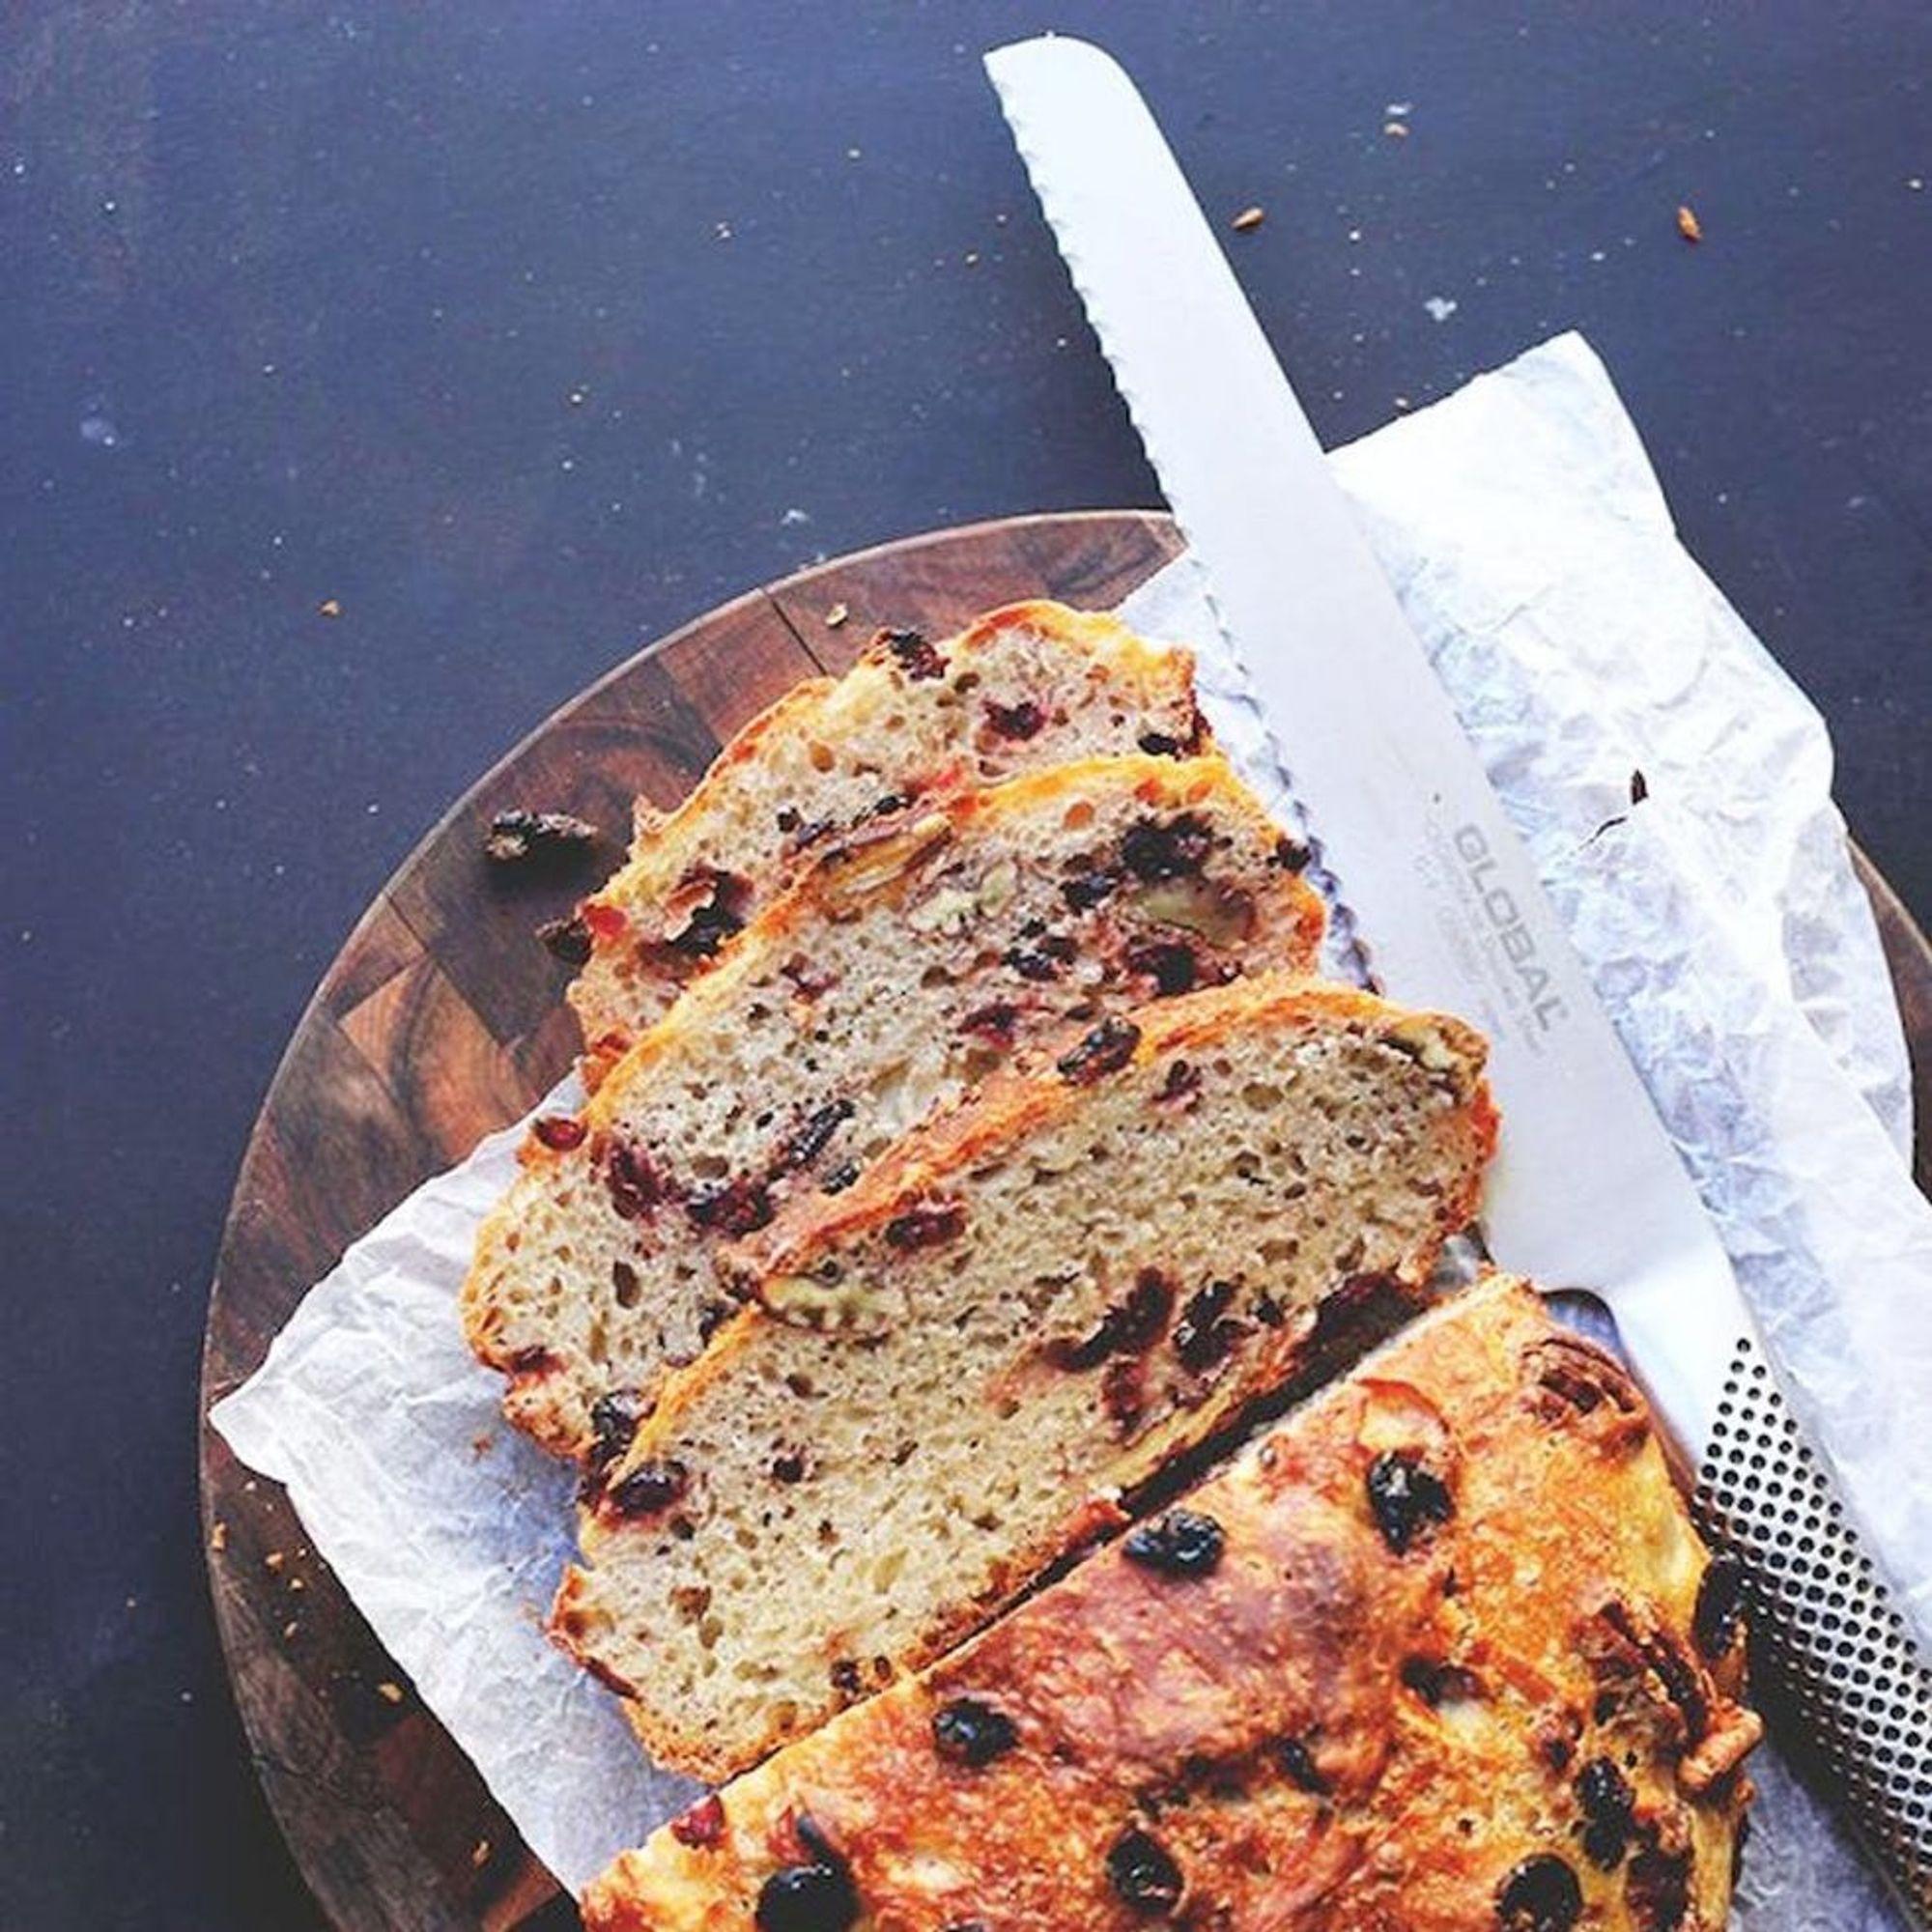 13 Easy No-Knead Bread Recipes Anyone Can Make